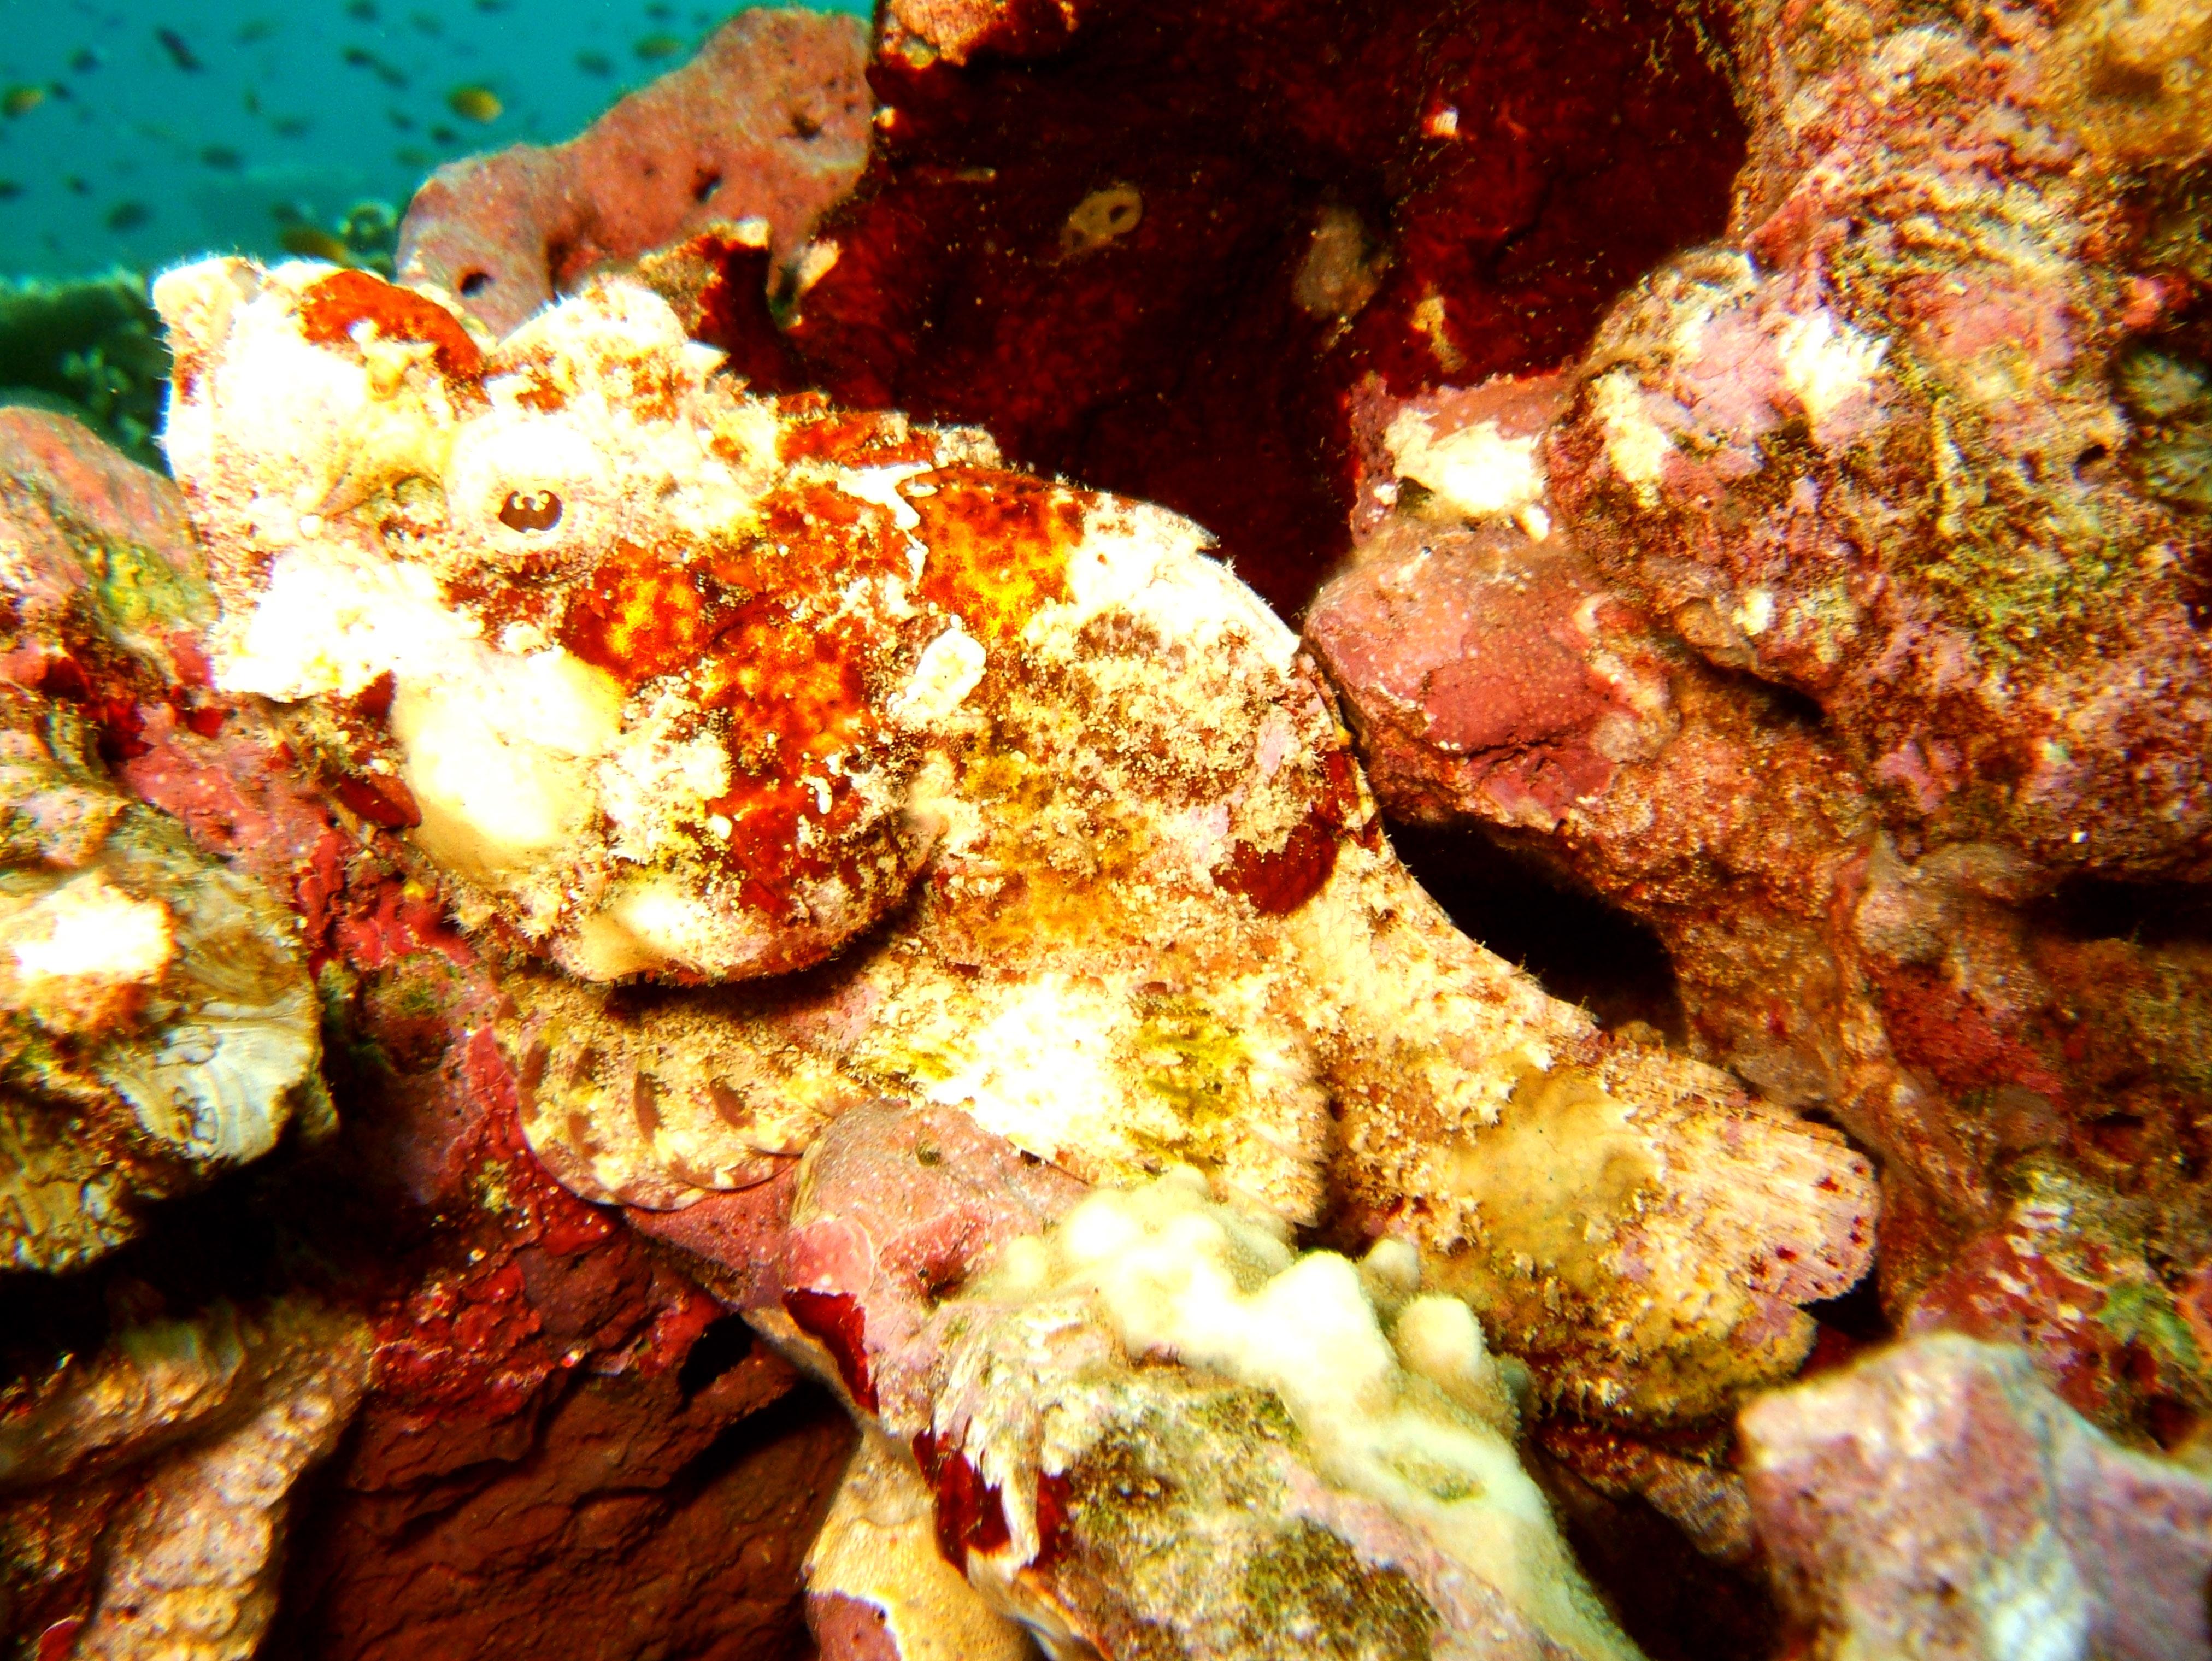 Philippines Cebu Moal Boal 20051227 Dive 1 Pescador Island 34